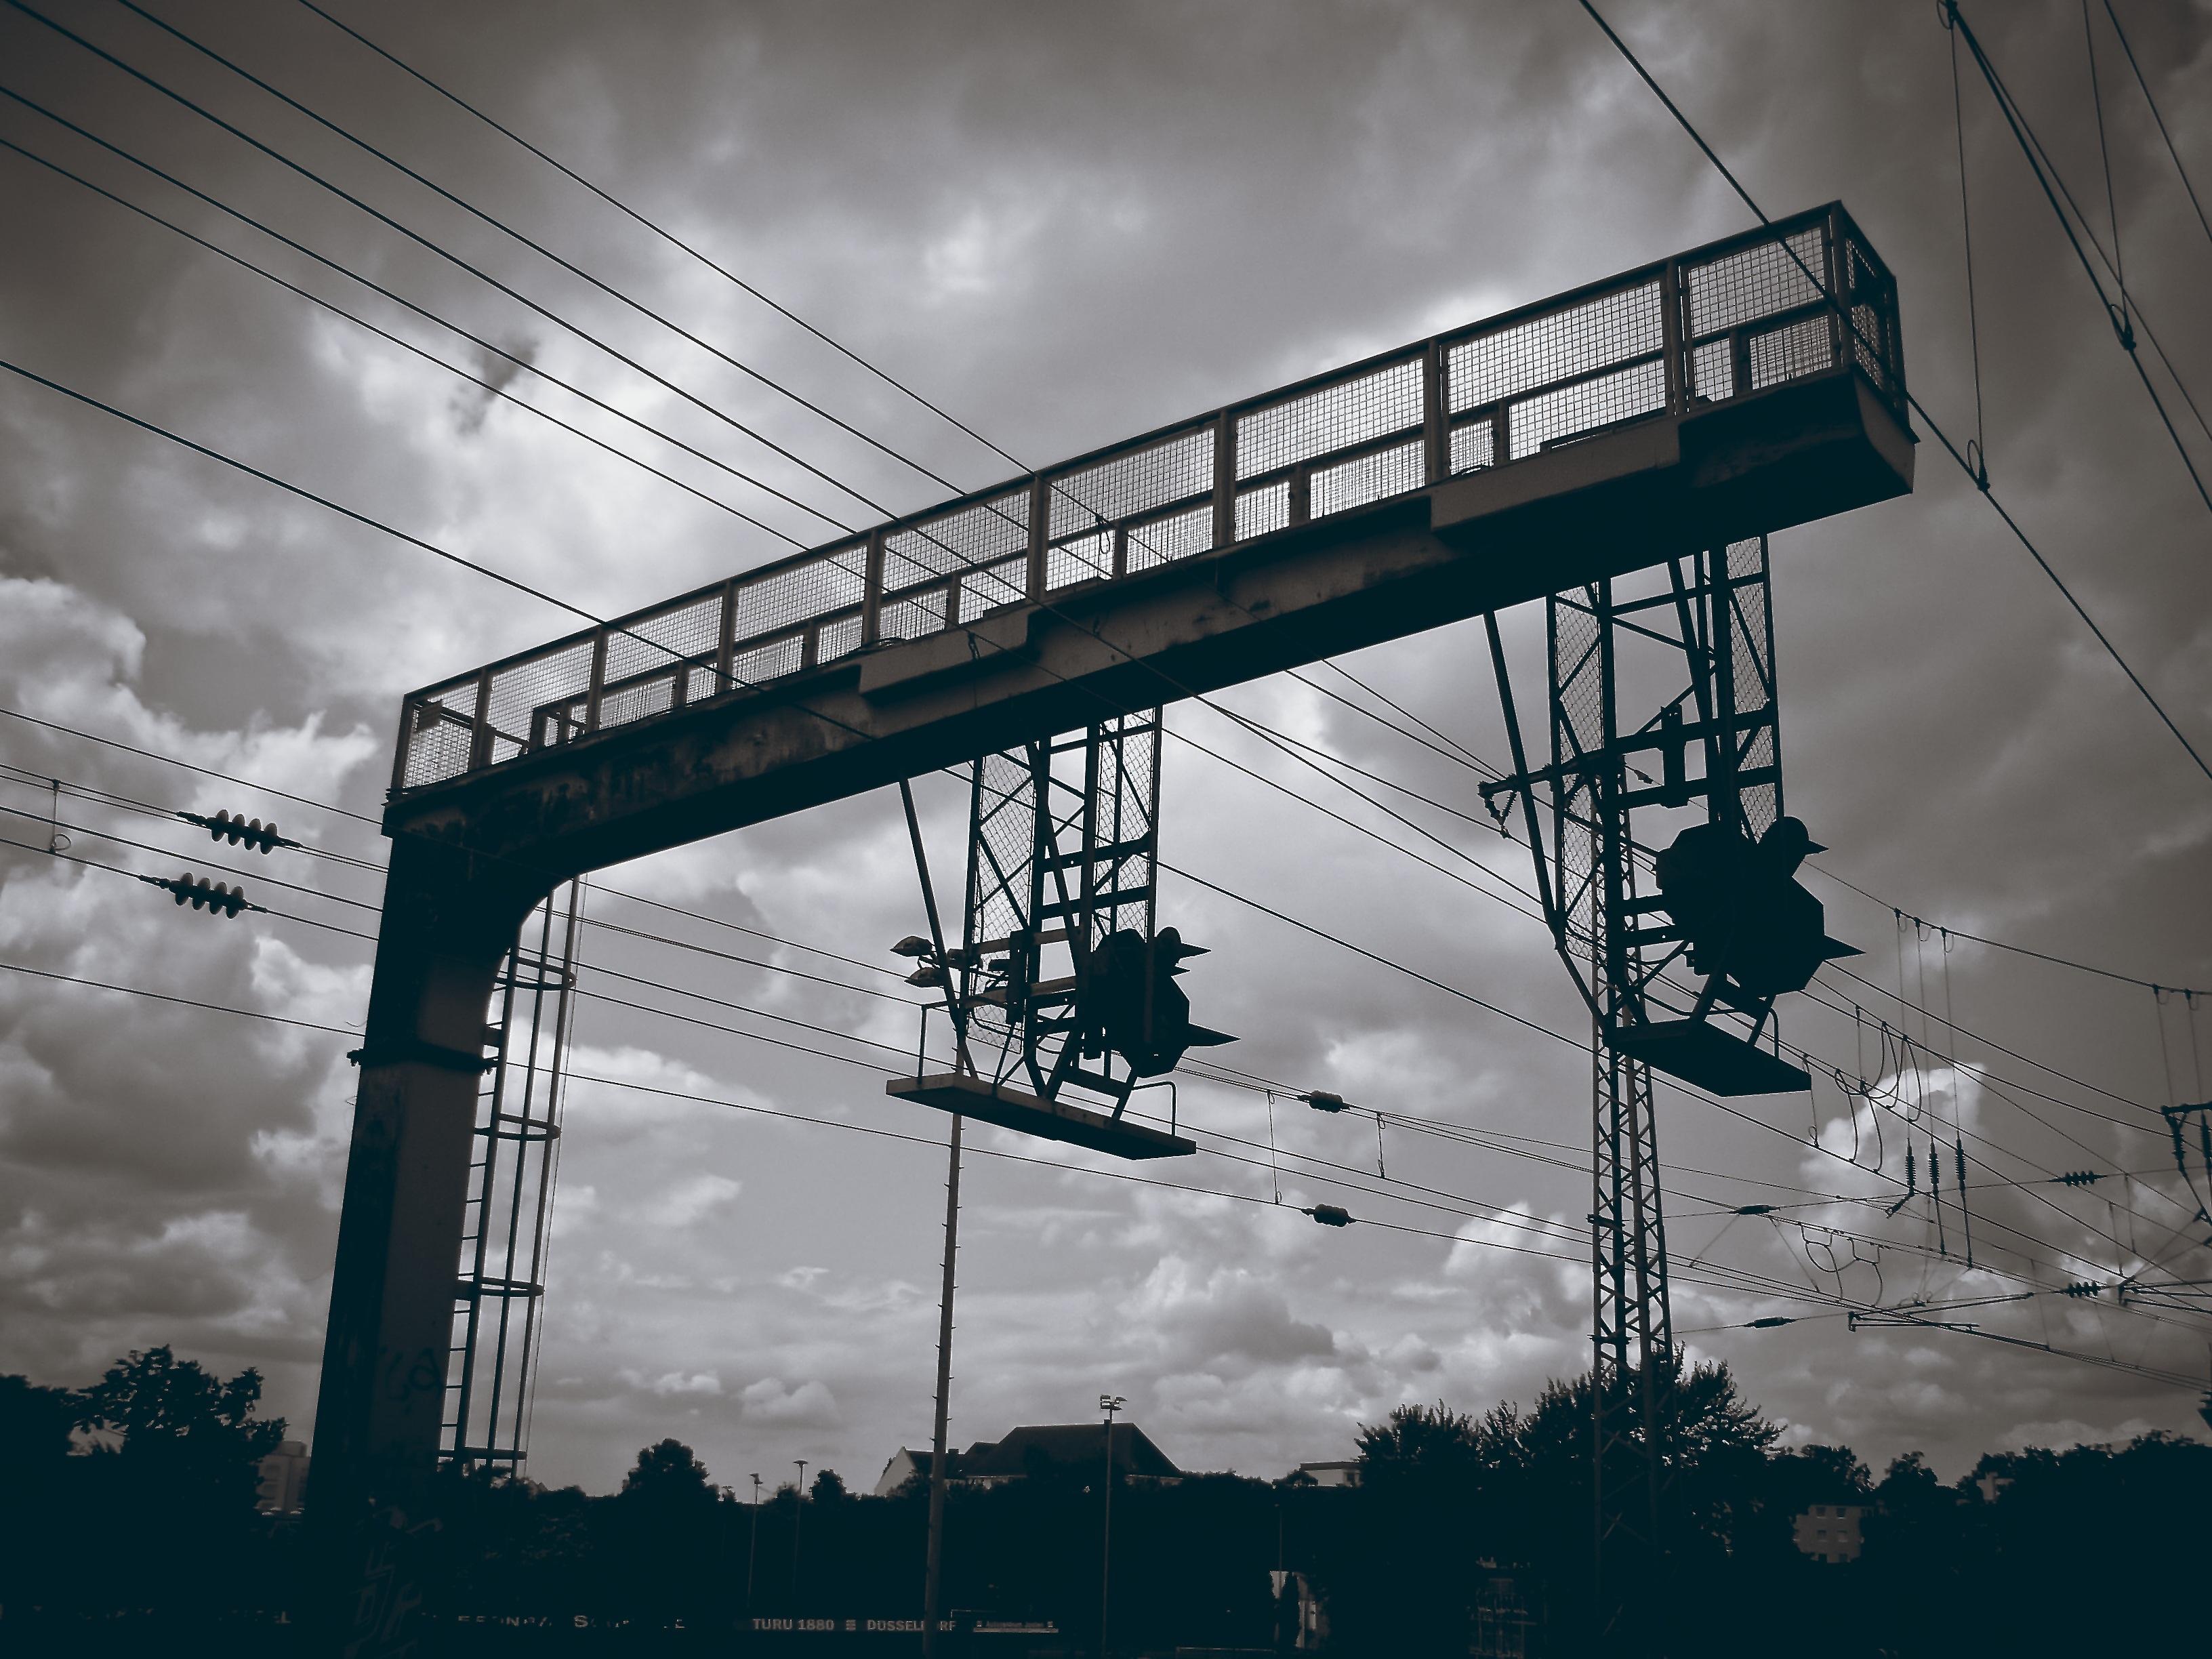 Free Images : snow, winter, bridge, train, dark, transport